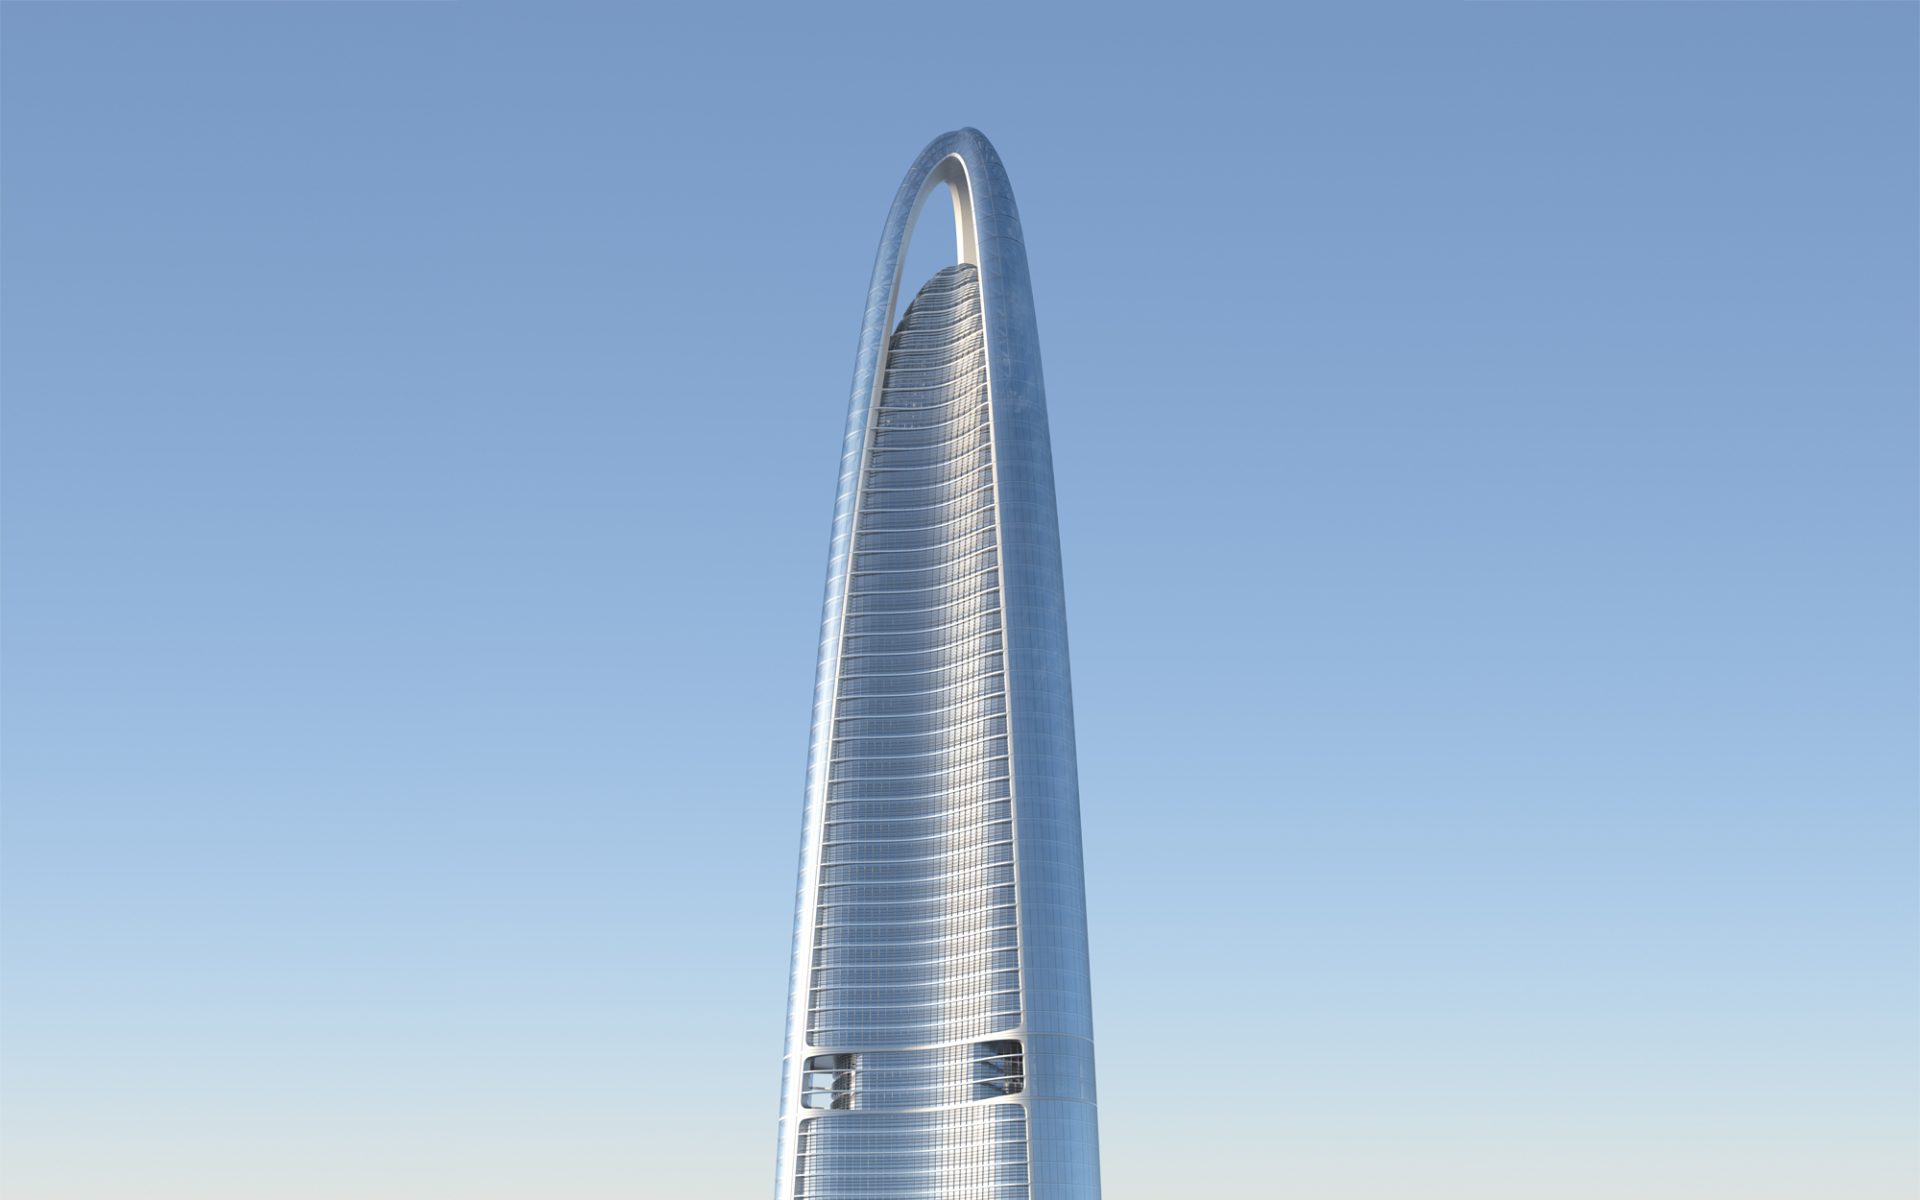 5. Wuhan Center (Ухань, Китай) – 437 метров.